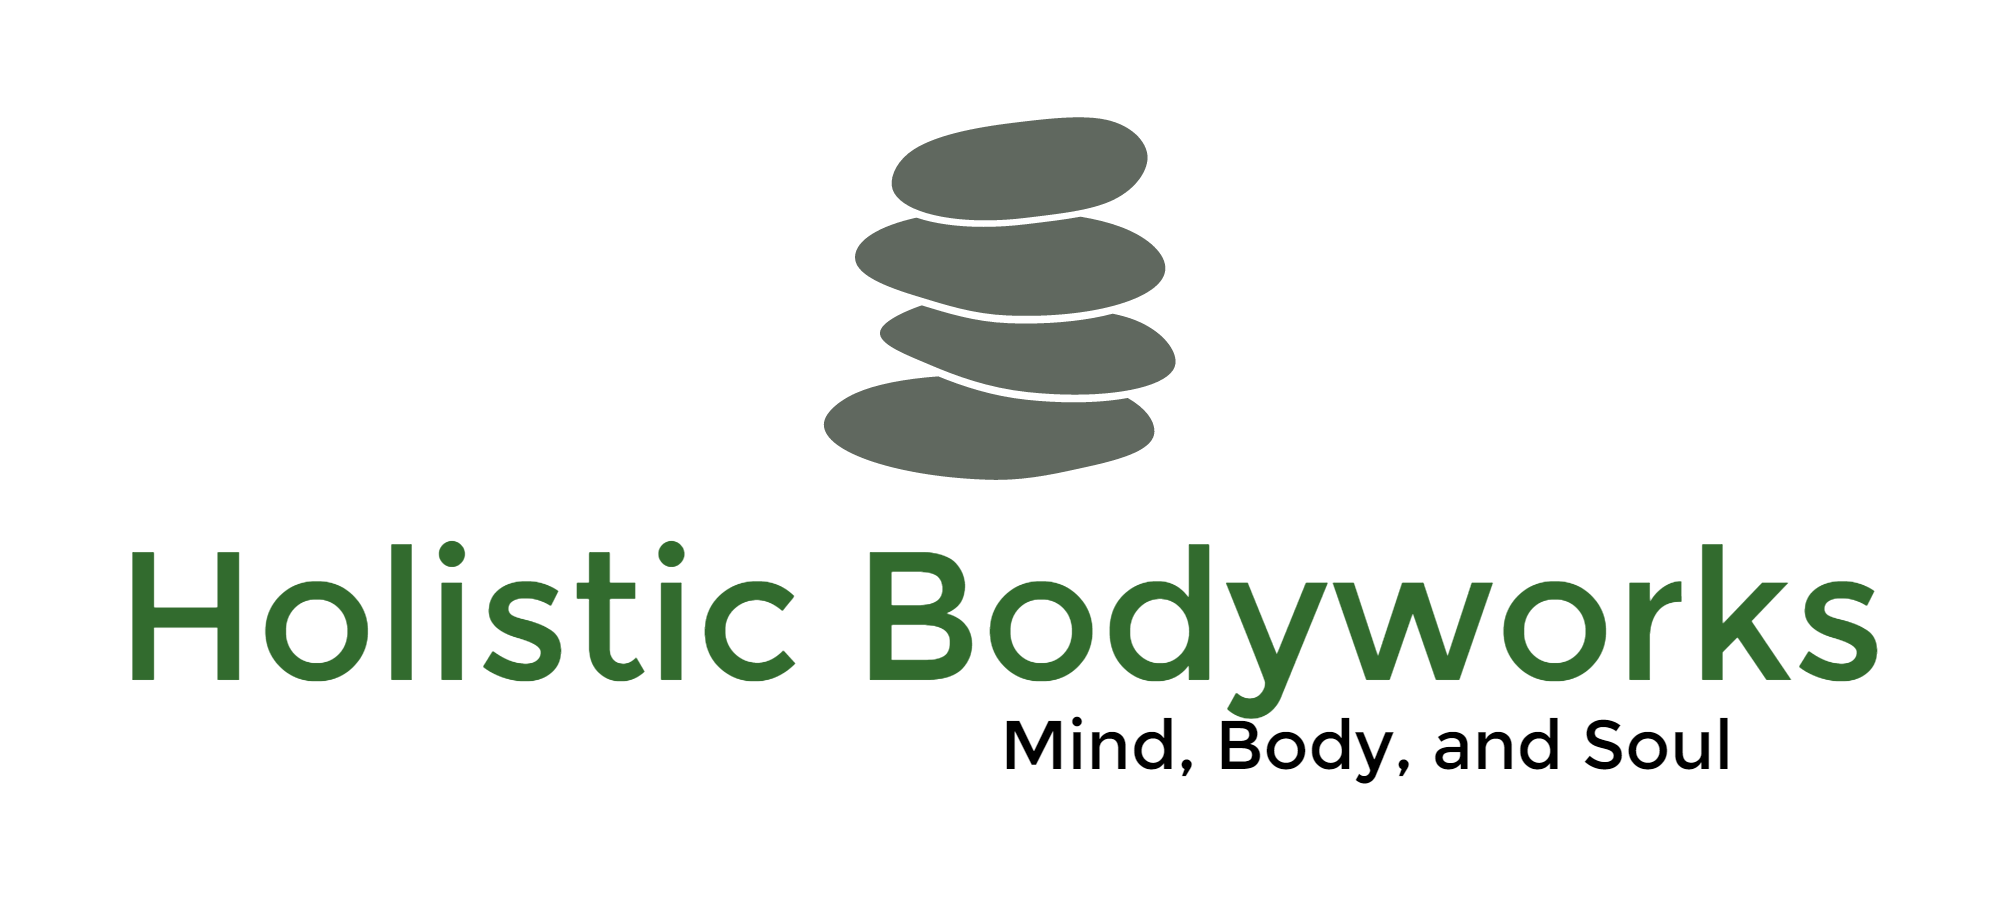 Holistic Bodyworks-logo (1).png